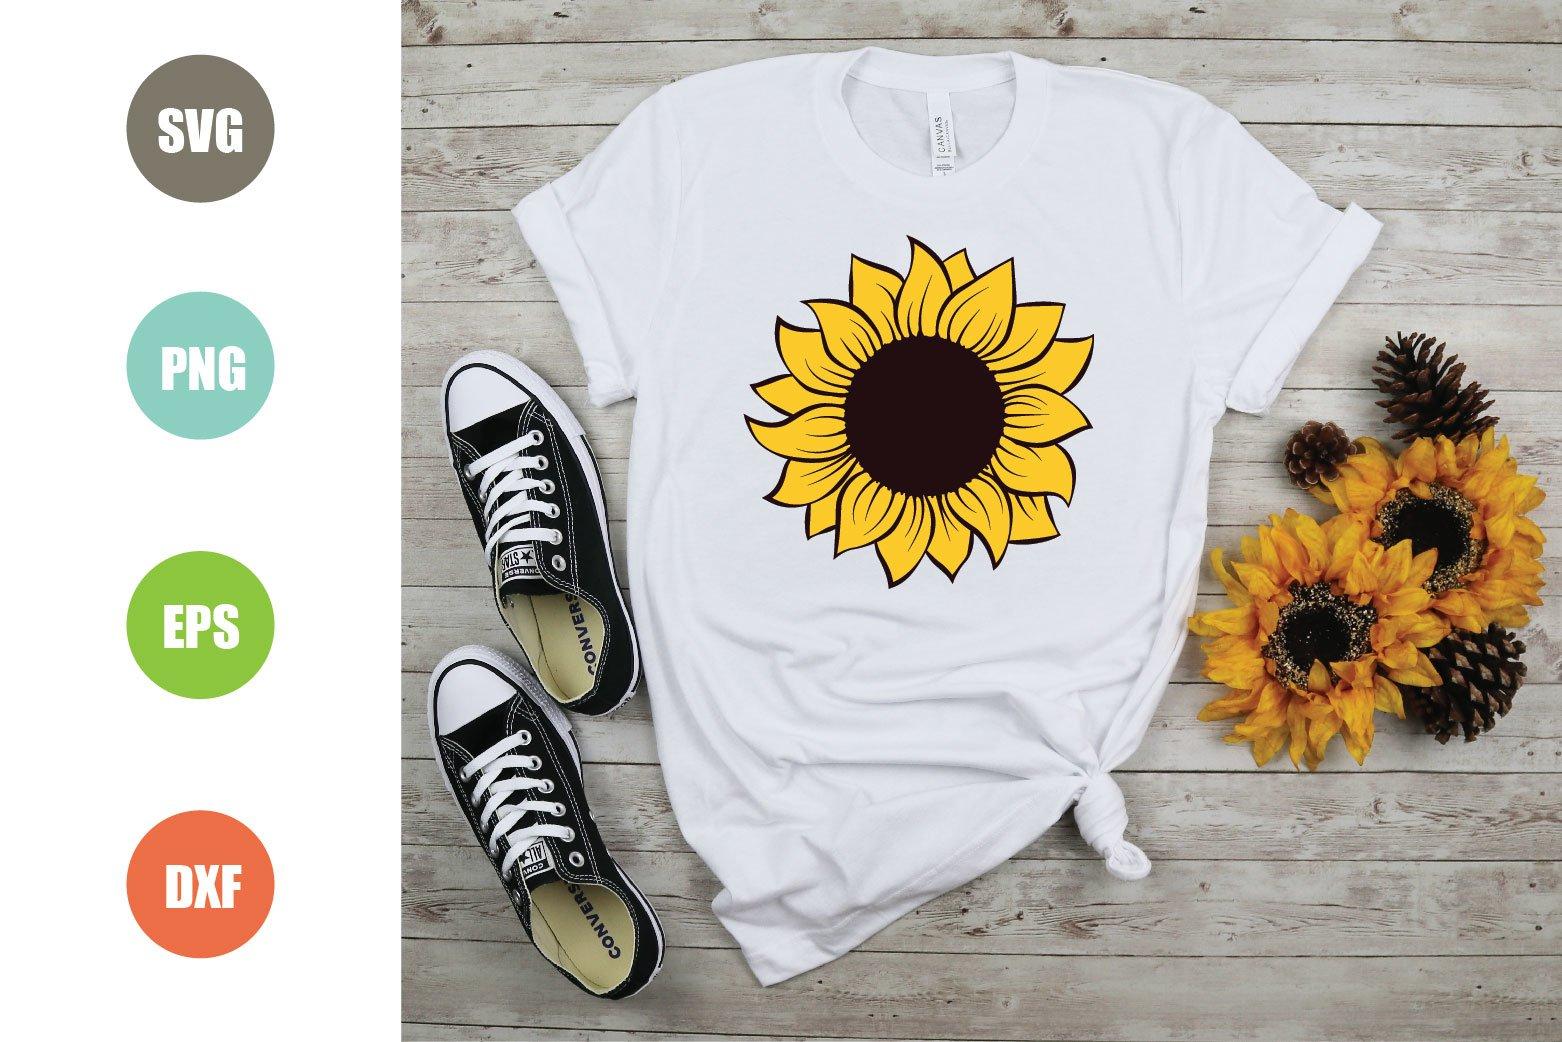 Sunflower SVG, Sunflower Monogram SVG example image 2